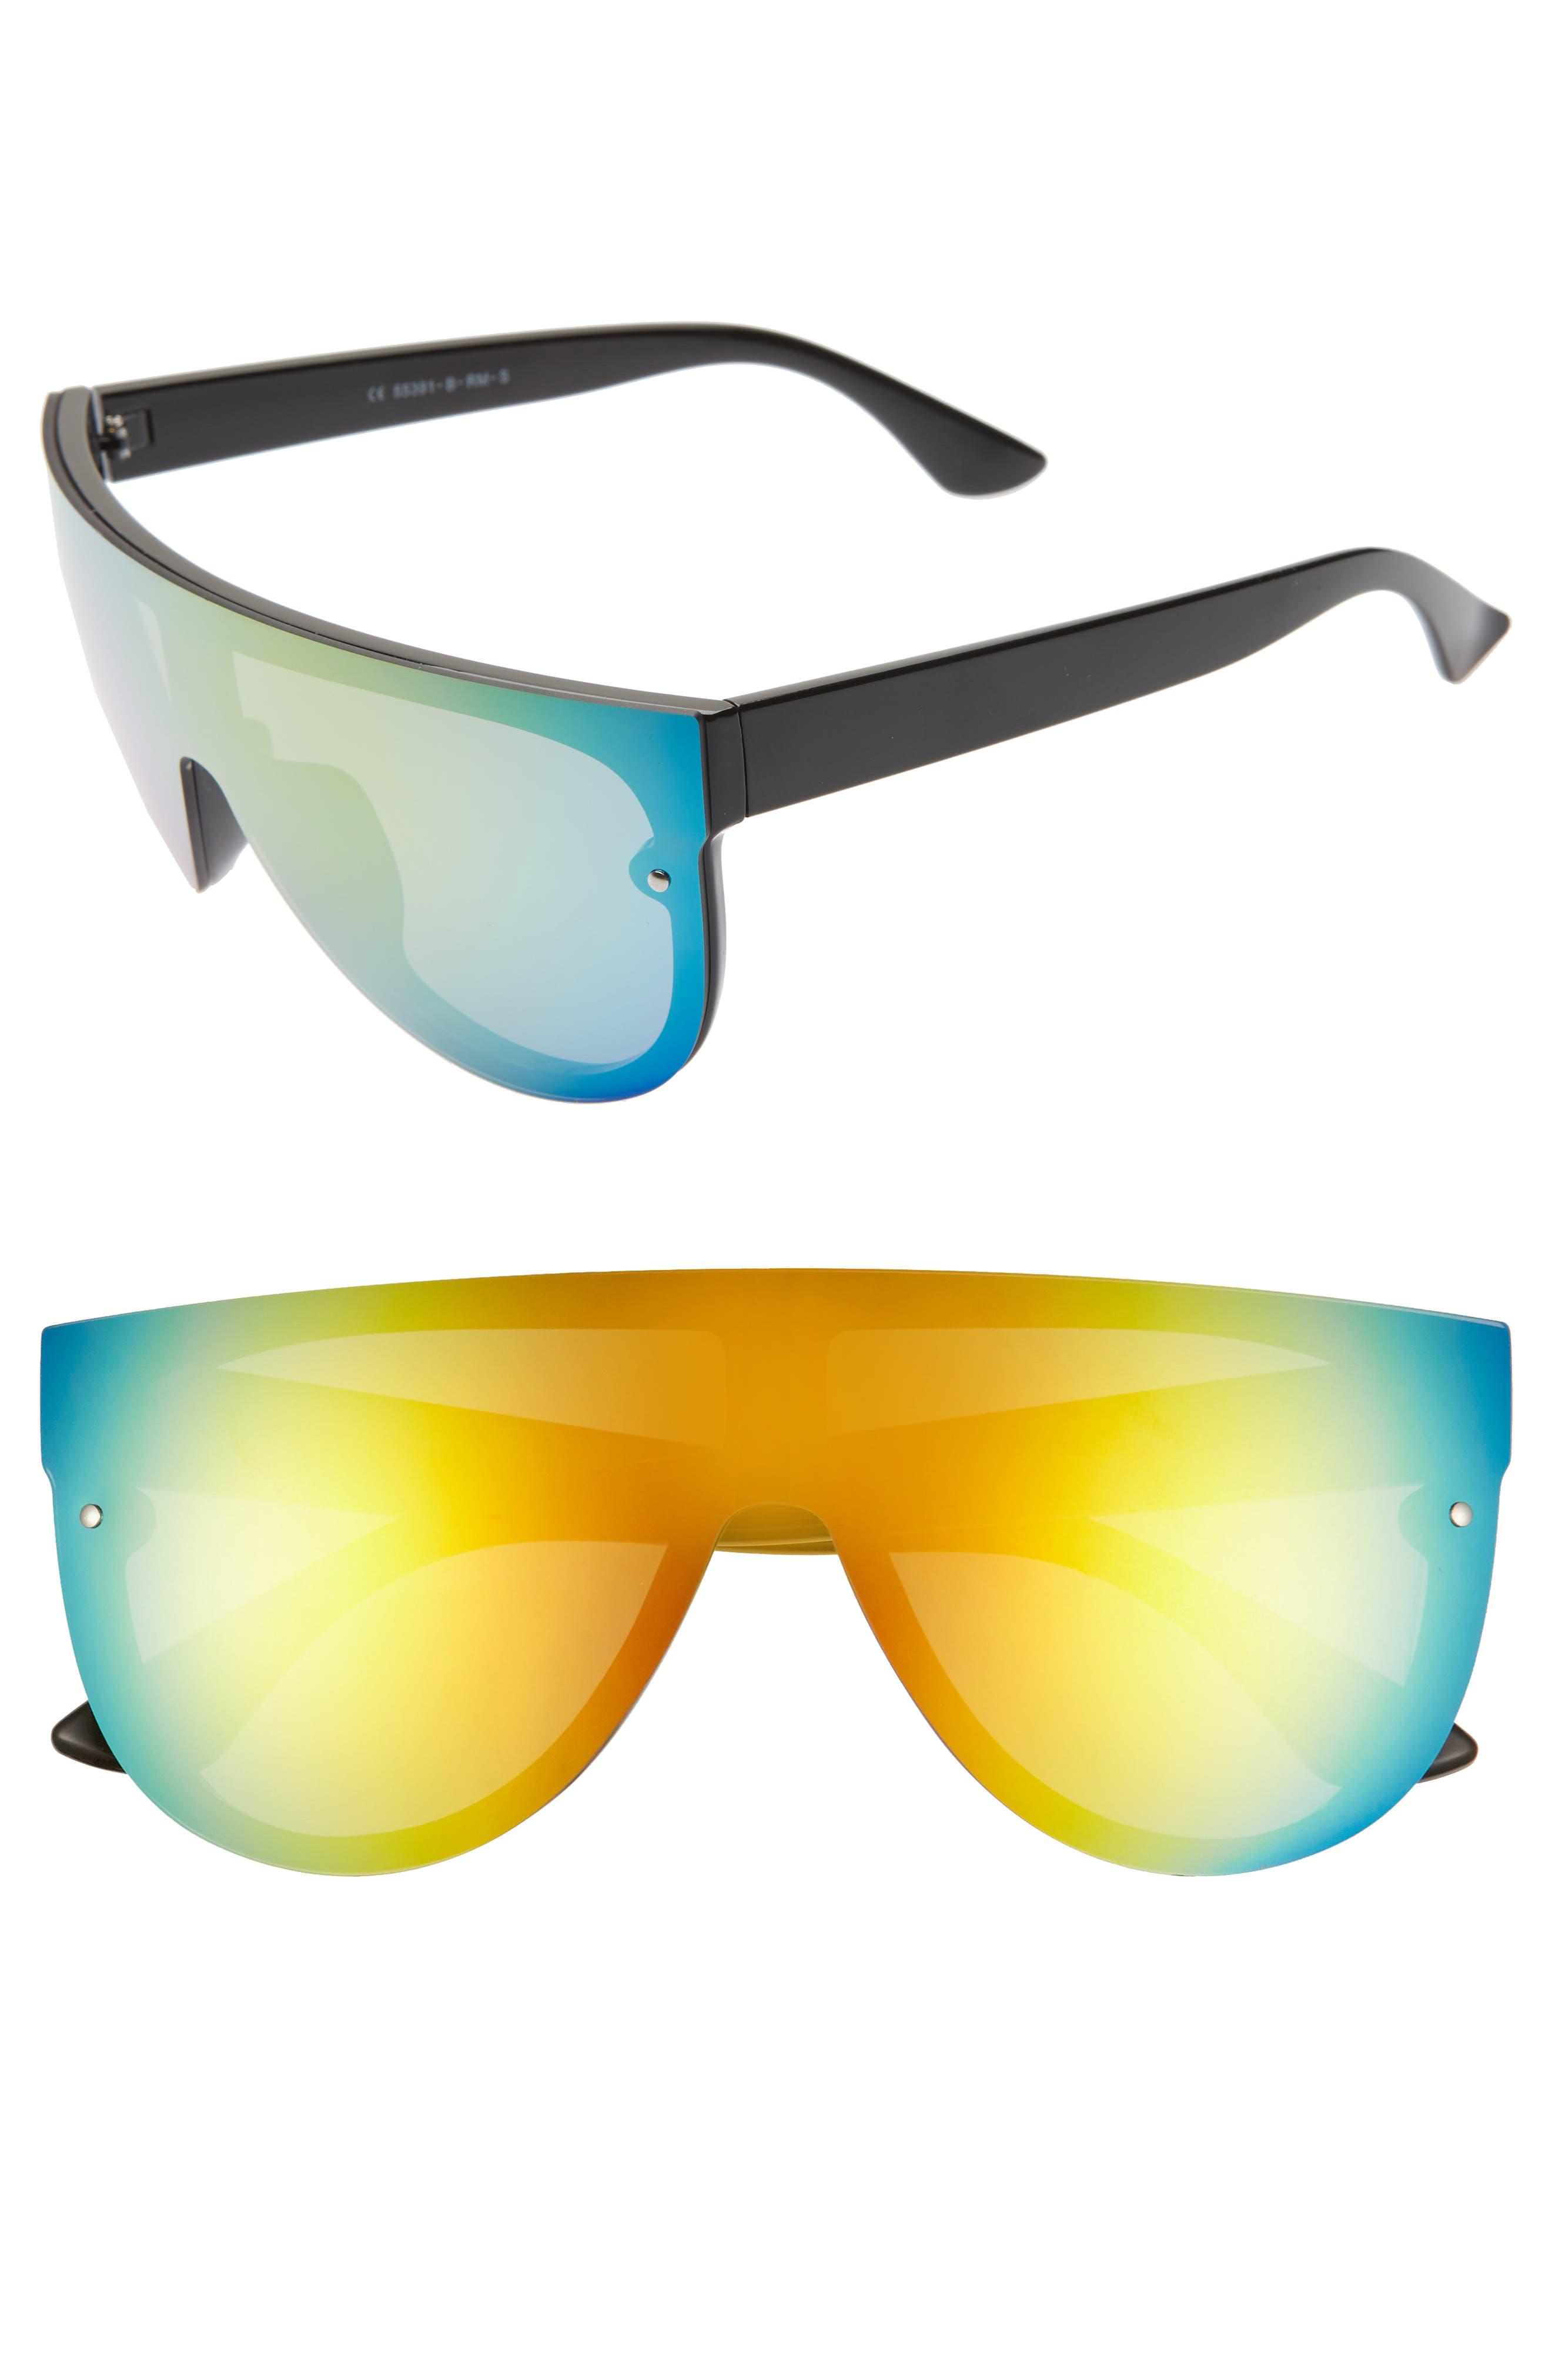 ee366867b209 Glance Eyewear Sunglasses for Women